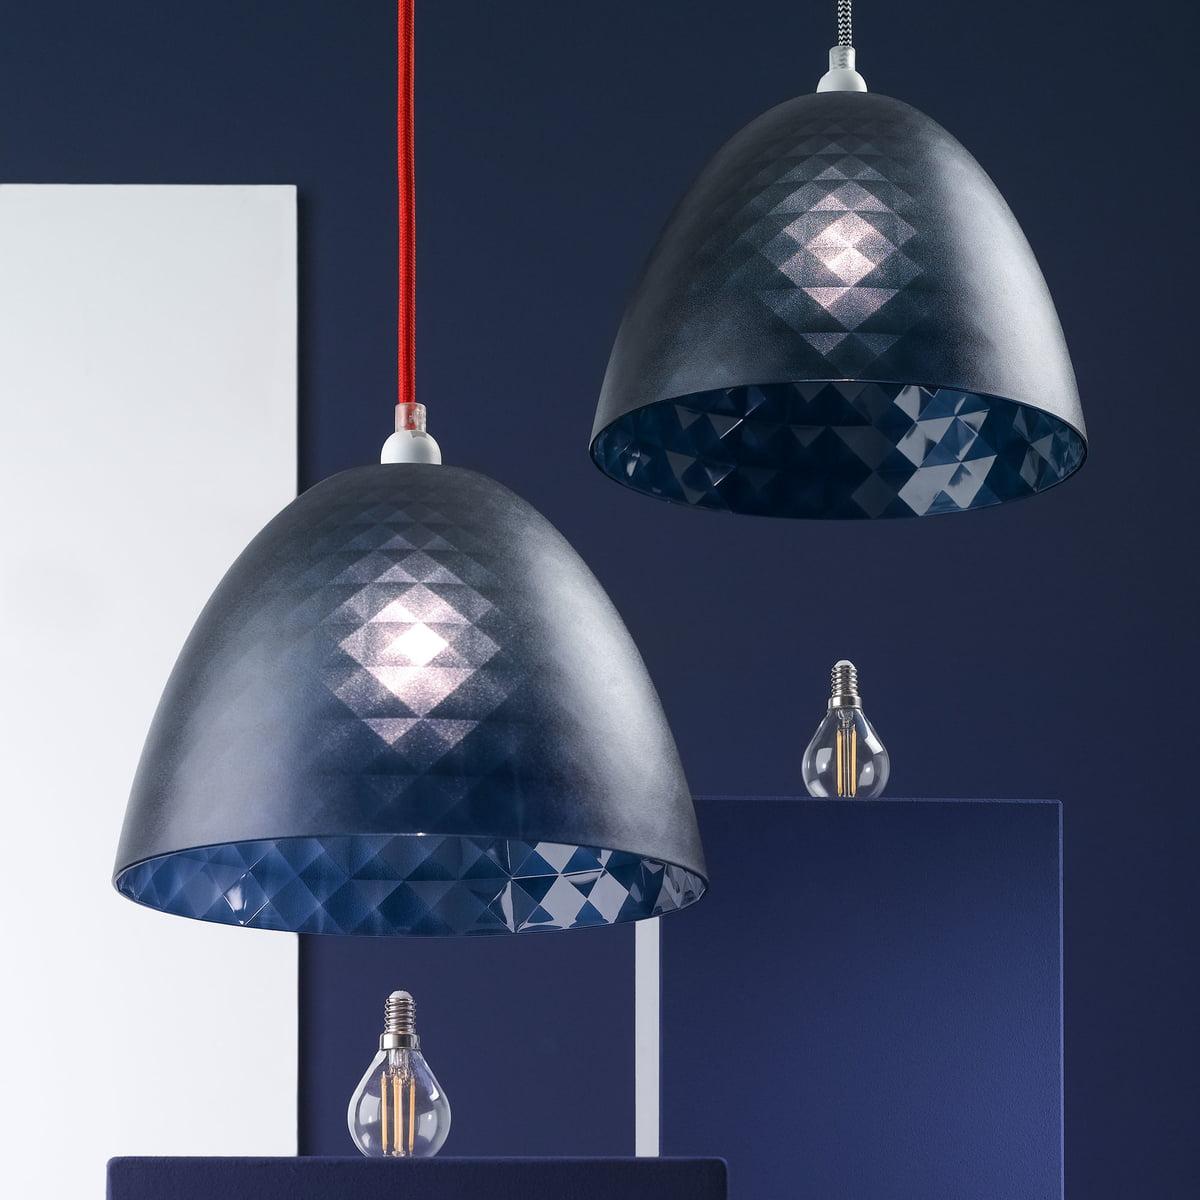 pendel f r lampenschirme von koziol connox. Black Bedroom Furniture Sets. Home Design Ideas